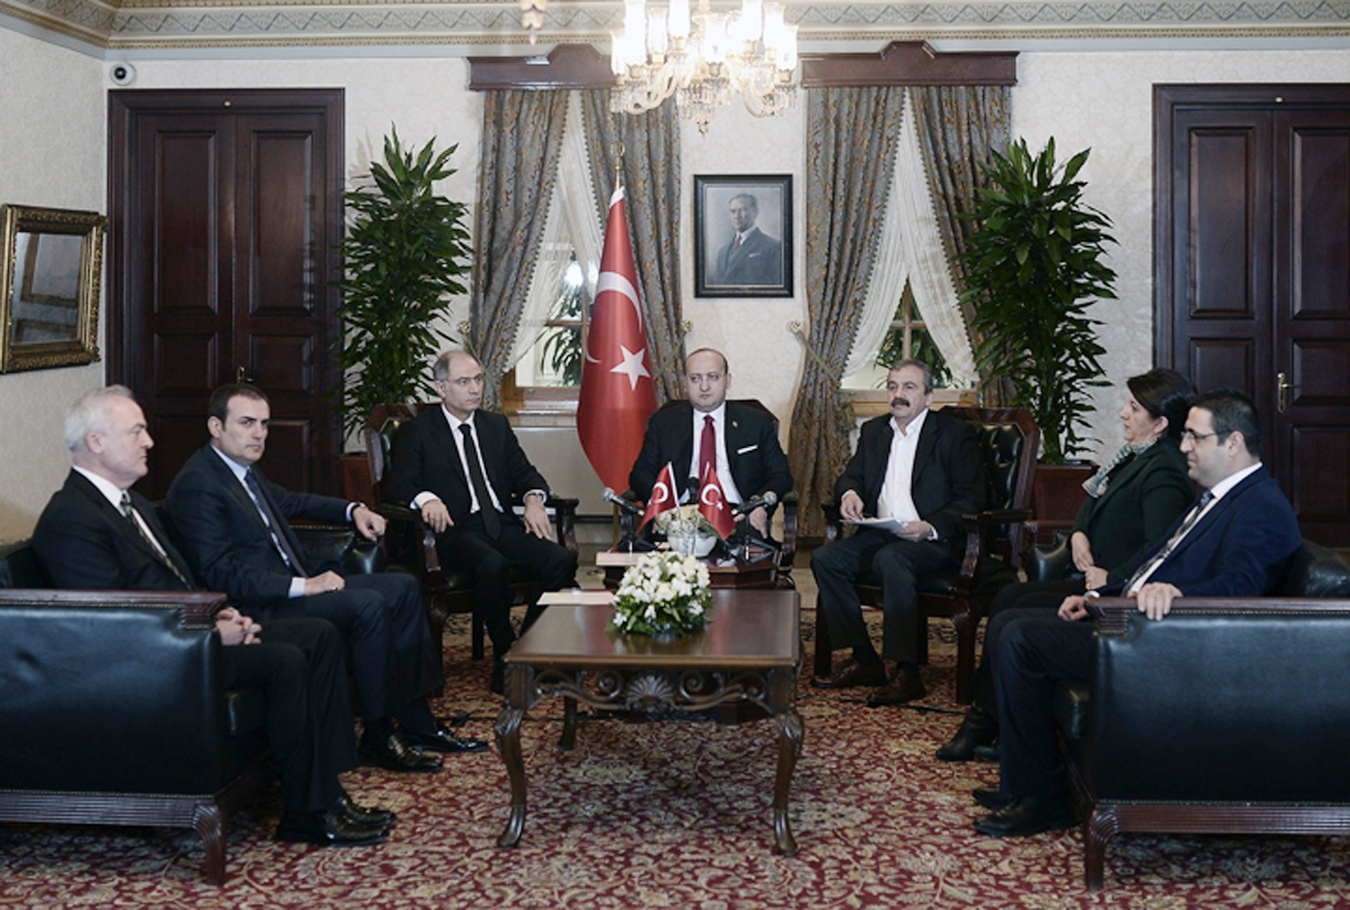 İki metnin analizi |  AKP ve Kürt siyaseti: Sokakta savaş, siyasi talepte uyum mu?